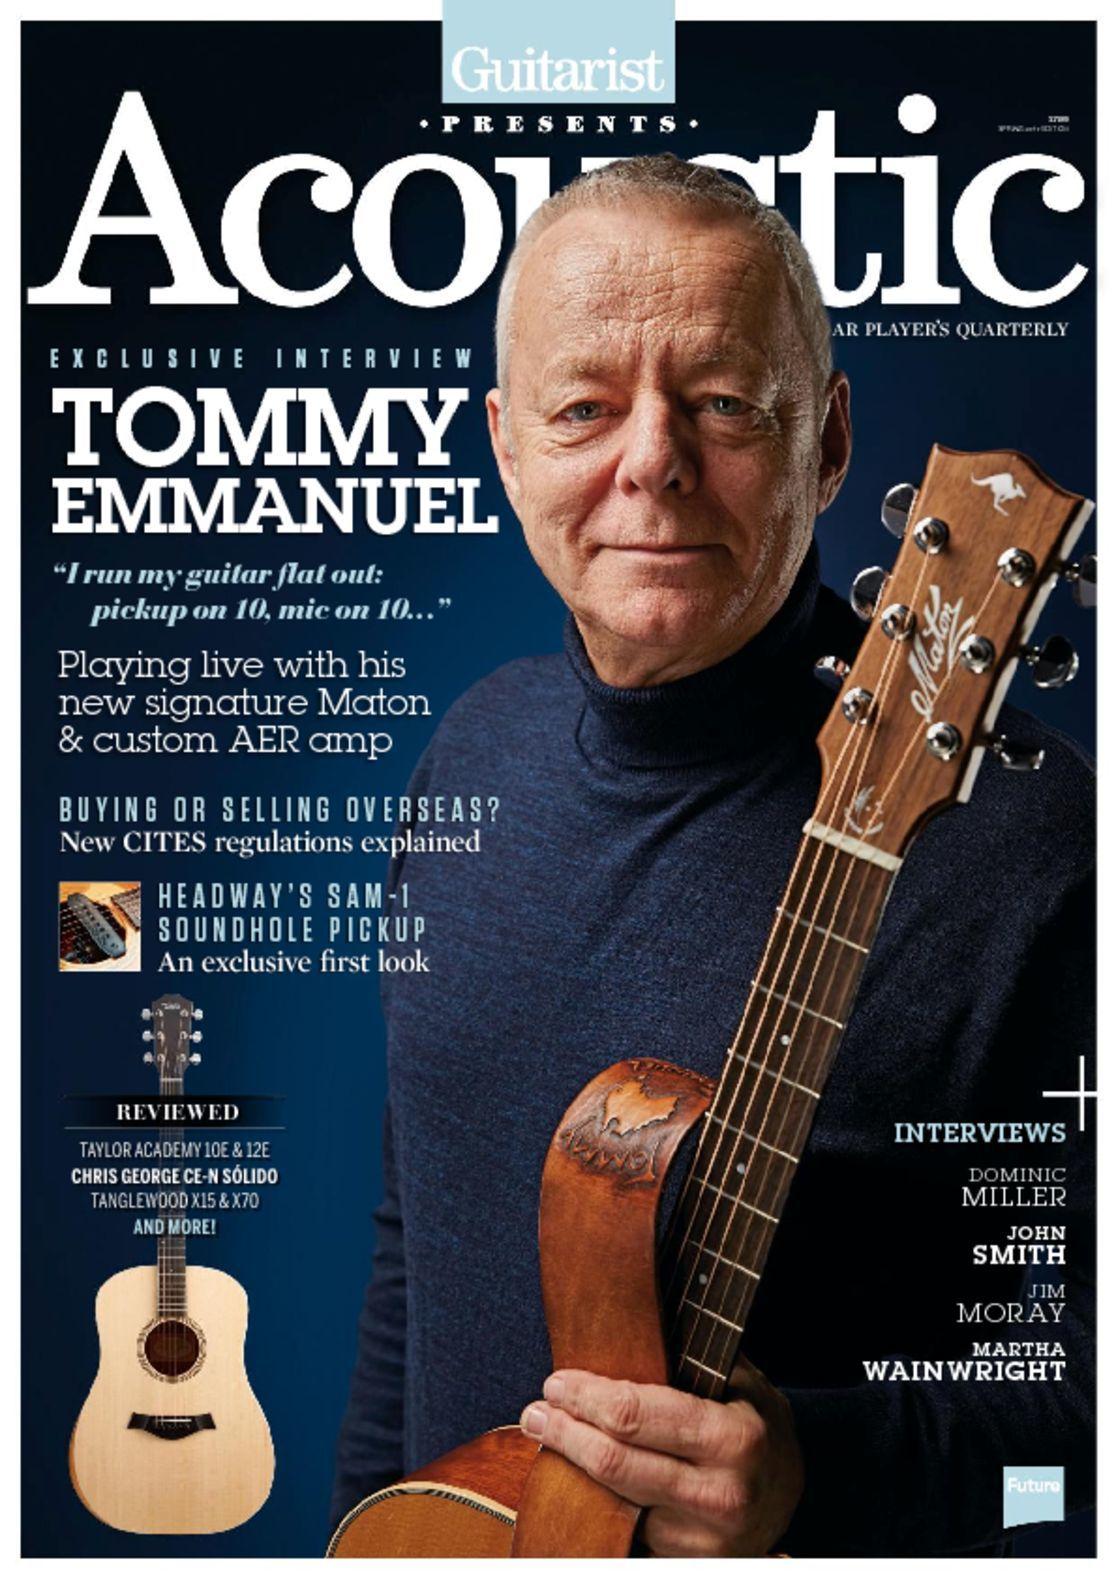 Guitarist Presents Acoustic Spring Digital